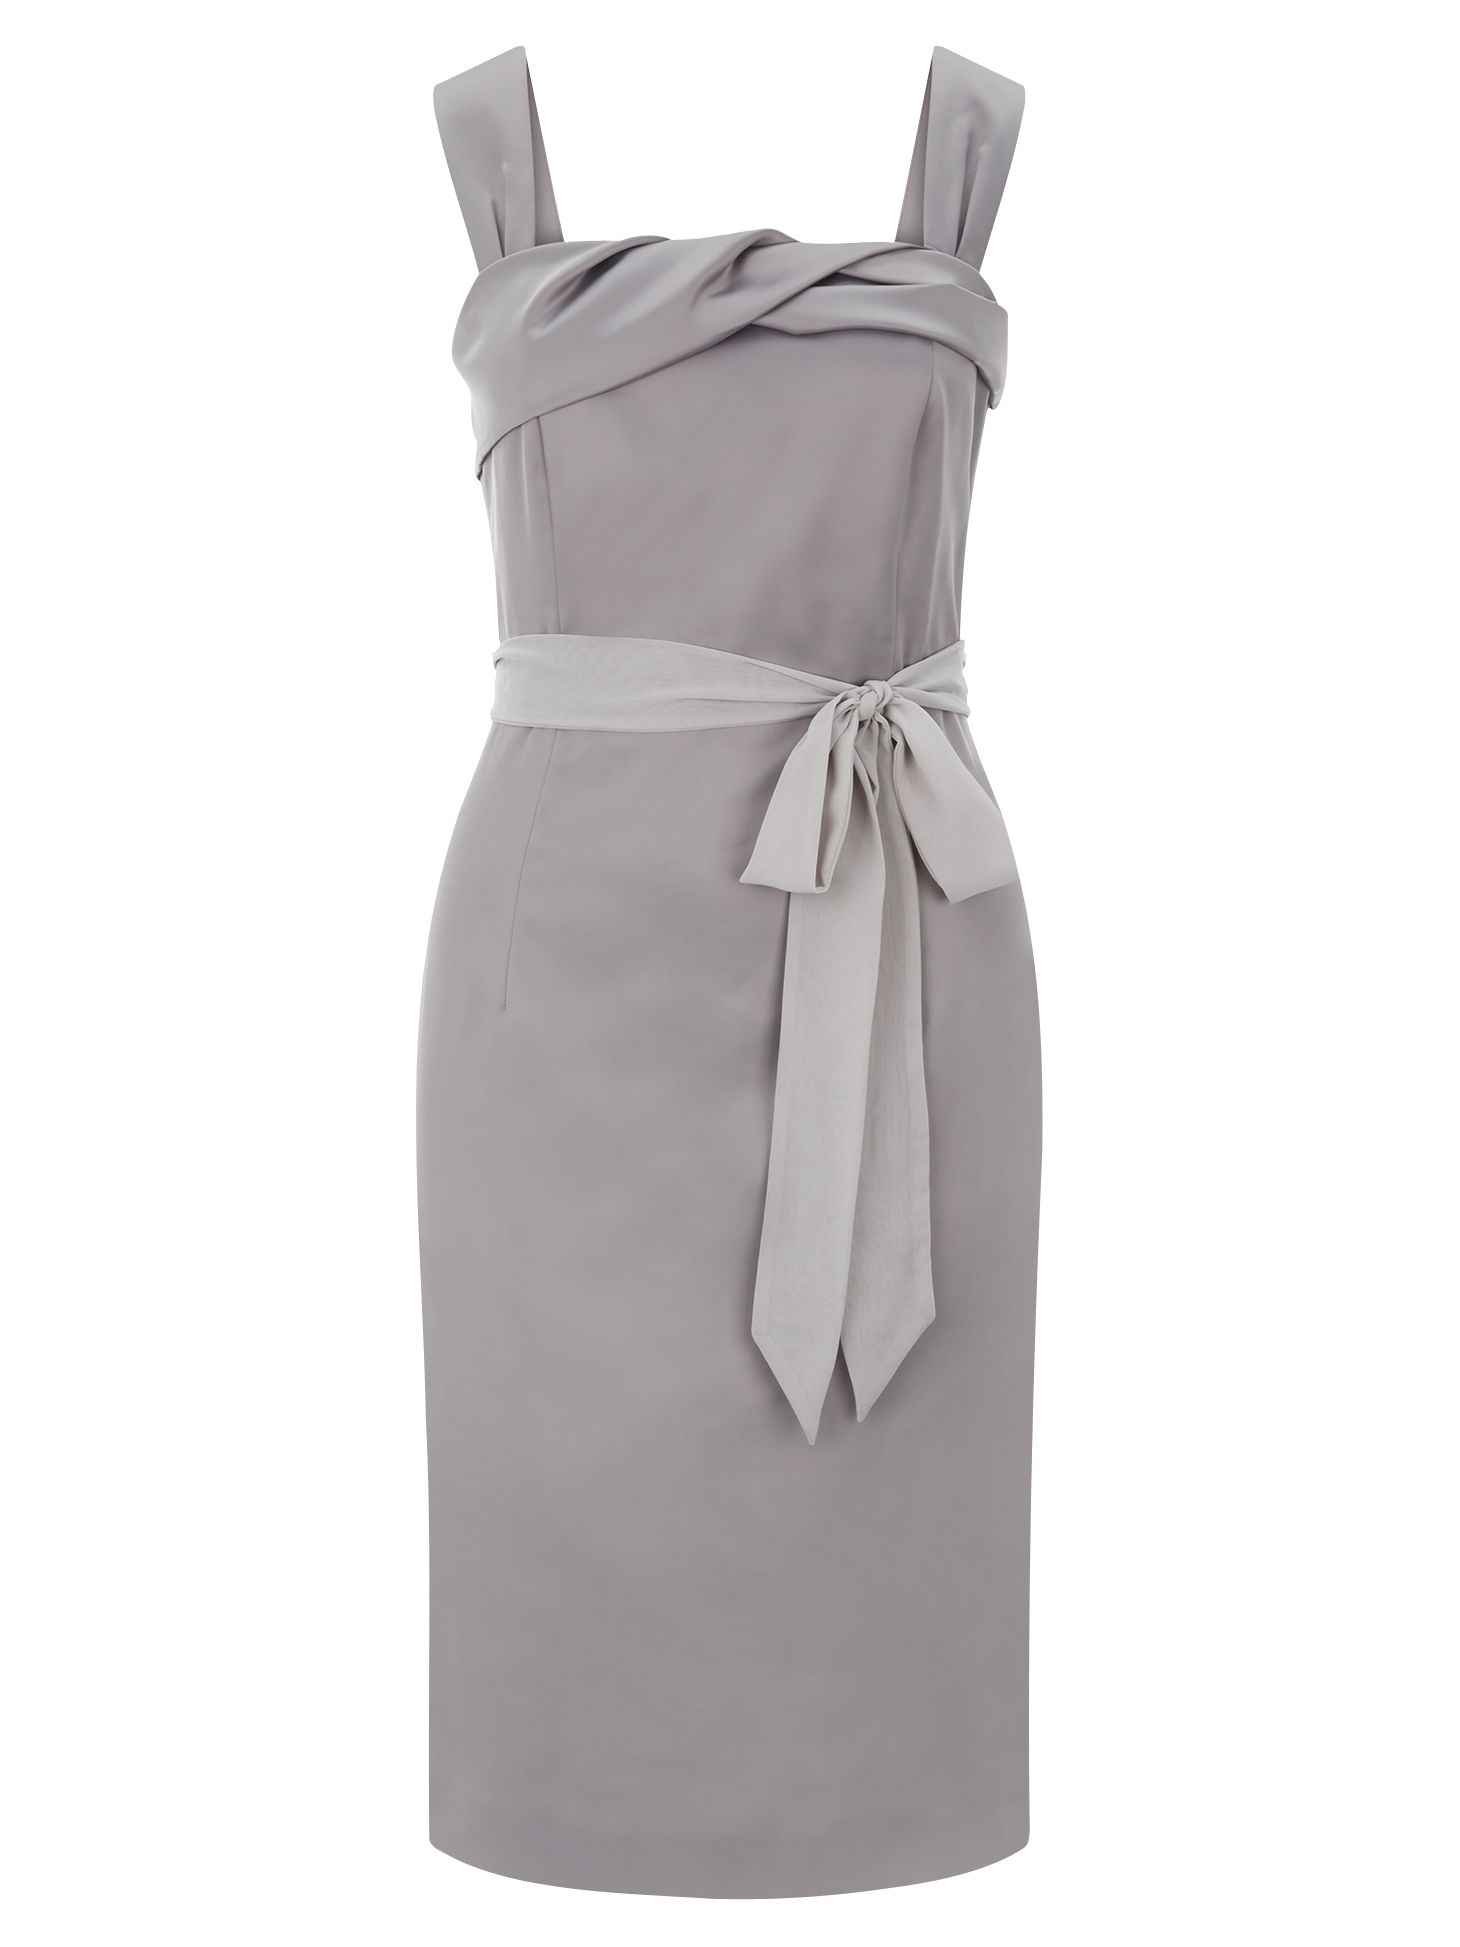 kaliko satin prom dress, kaliko, satin, prom, dress, light pink|light grey|light grey|light grey|light grey|light grey|light grey|light pink|light pink|light pink|light pink|light pink|light pink|light grey, 10|20|10|18|12|16|14|8|12|20|16|14|18|8, women, plus size, womens dresses, special offers, womenswear offers, womens dresses offers, 1853315